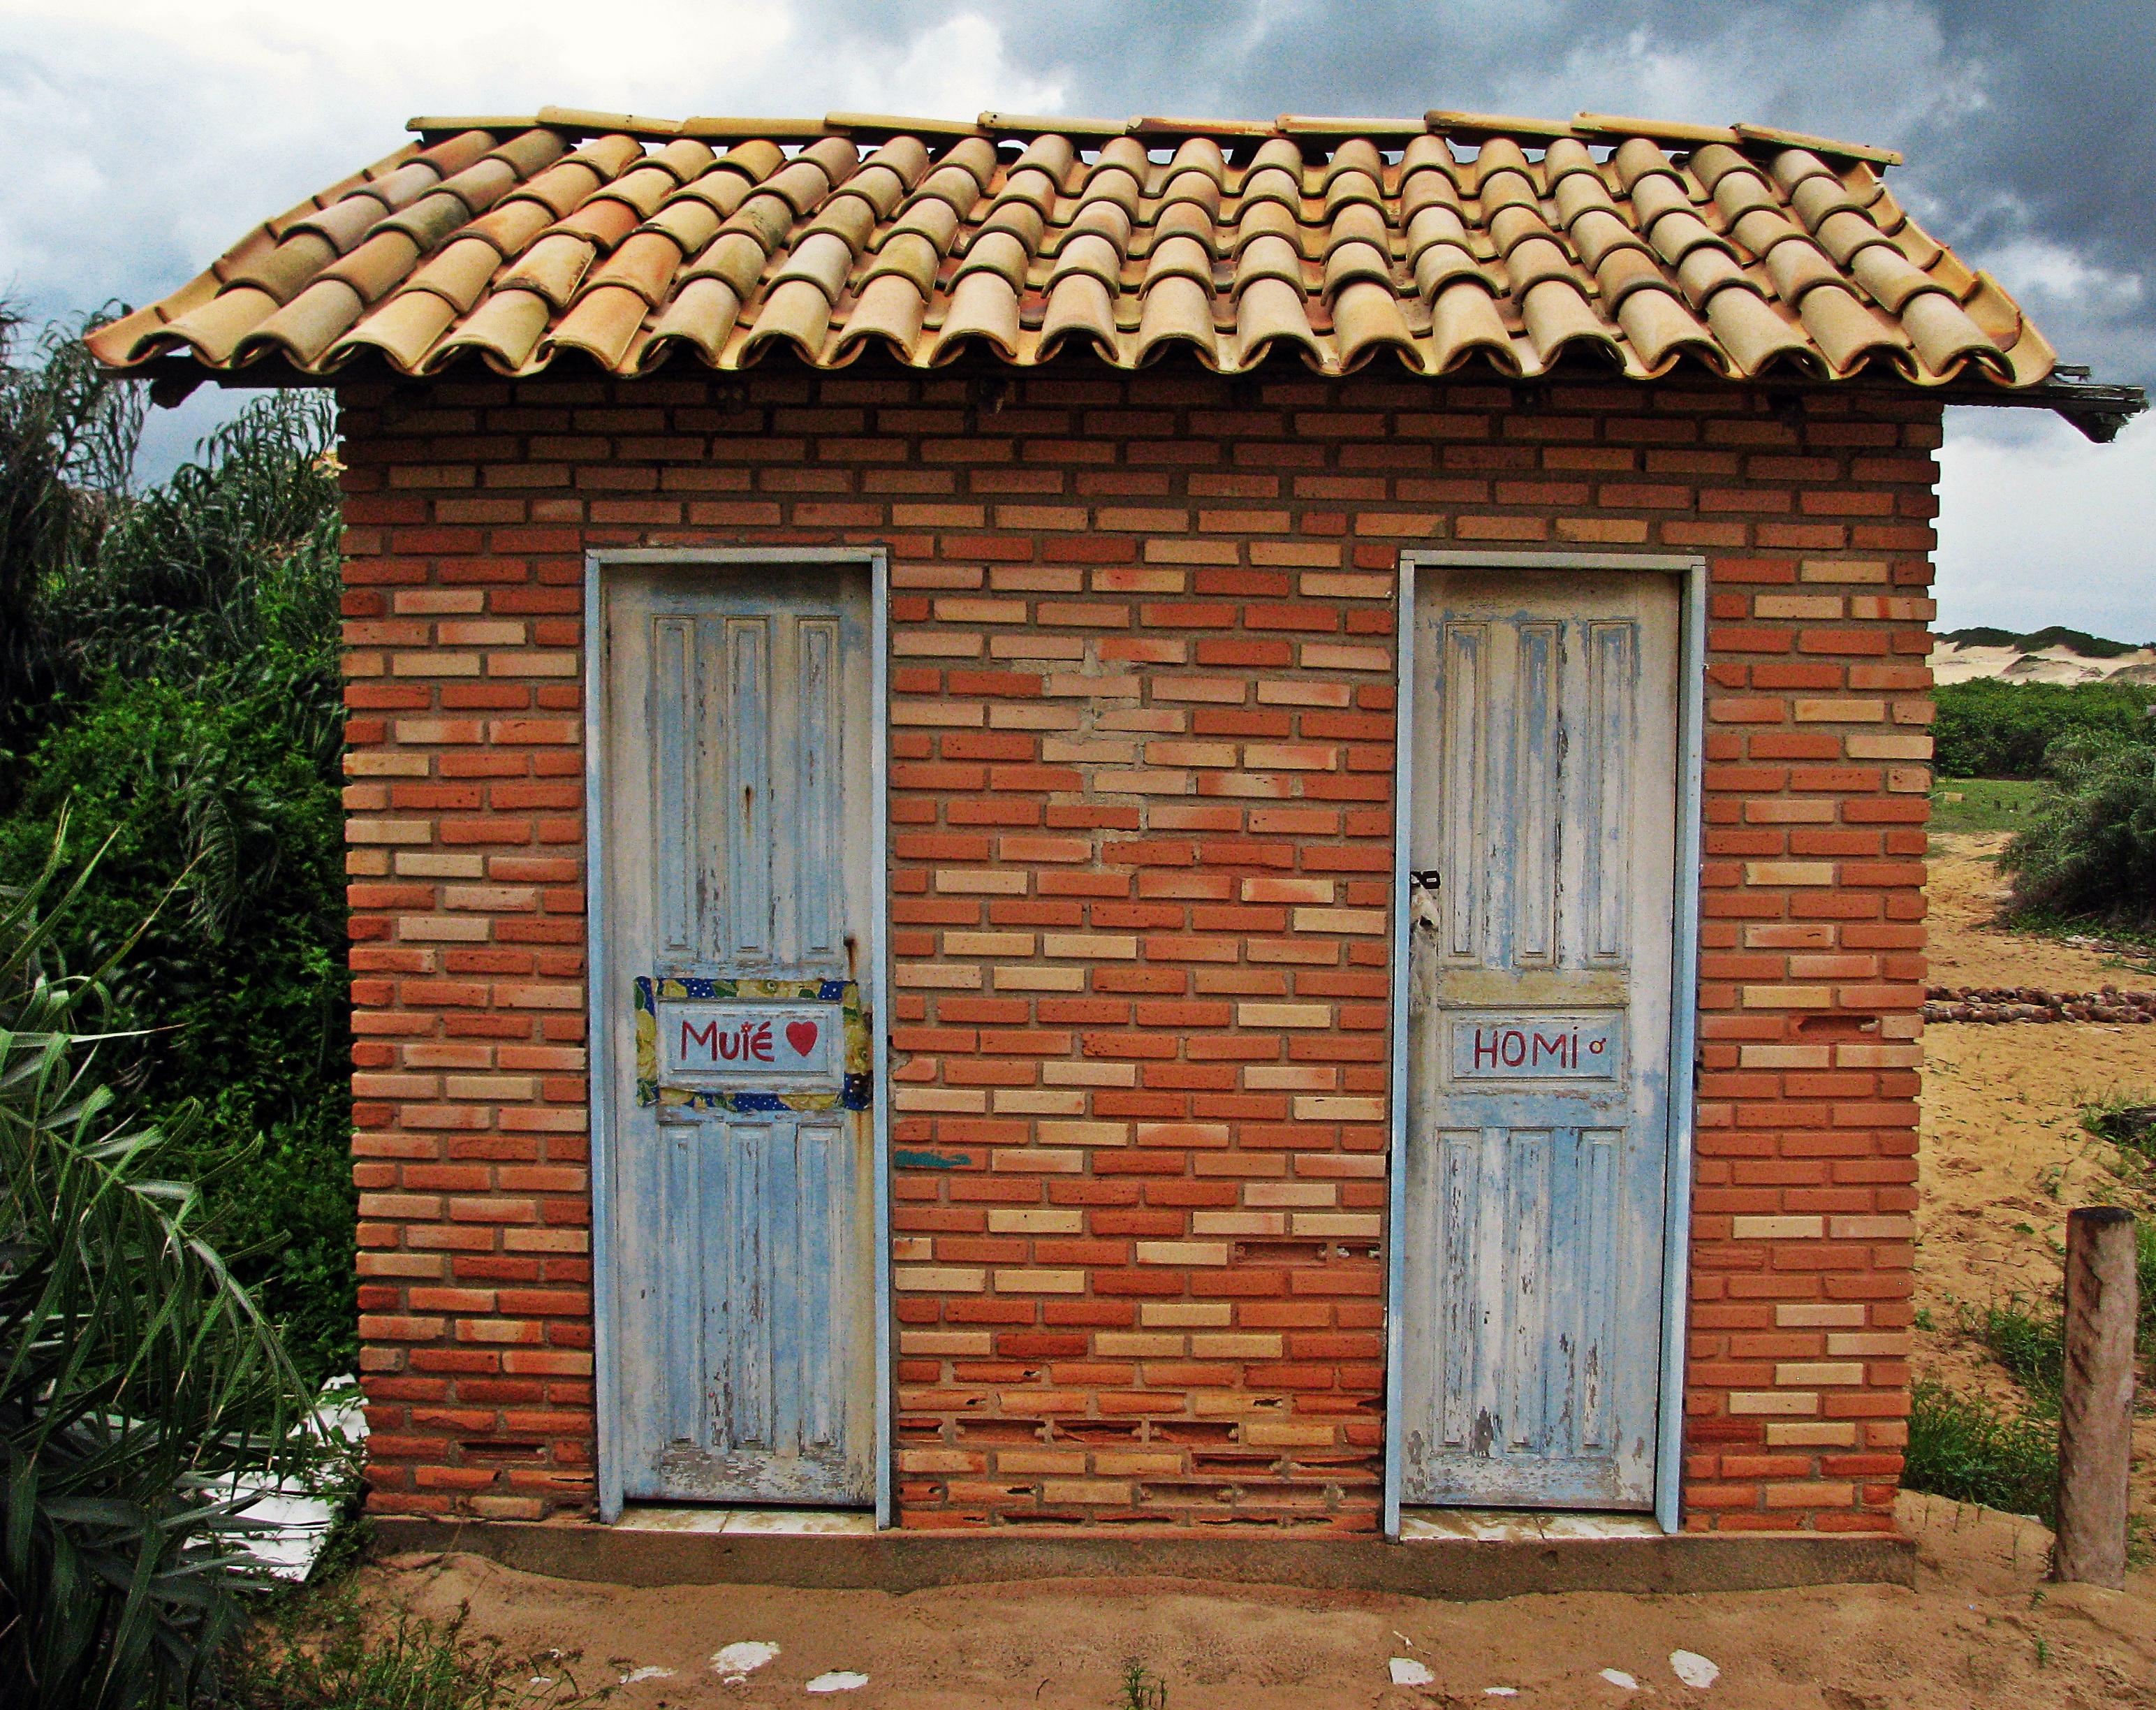 Shed door with window kostenlose foto holz haus fenster for Haus fenster